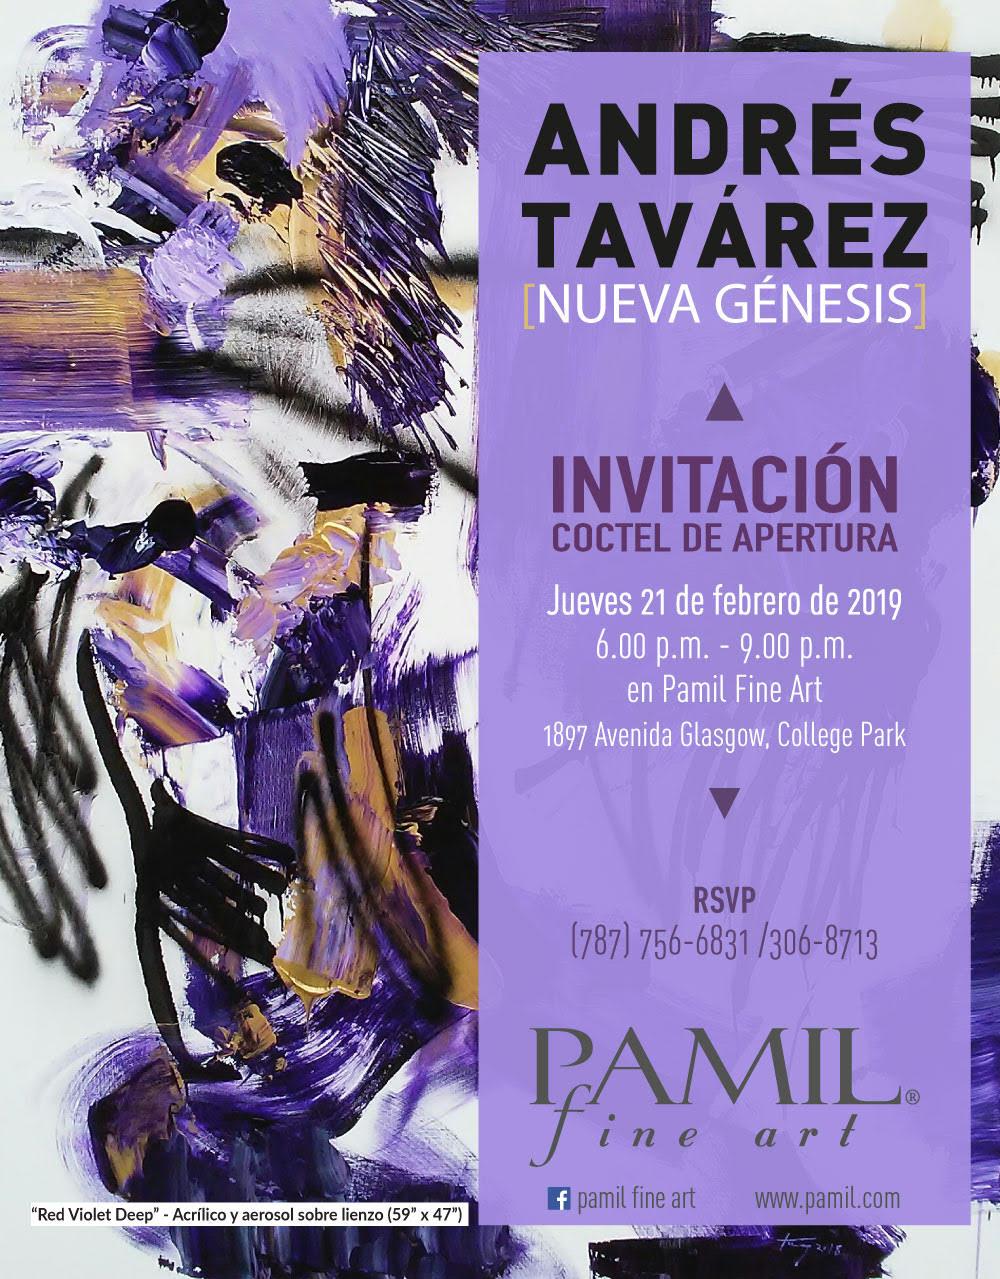 INVITACION COCTEL PAMIL FINE ART-1-03.jpg